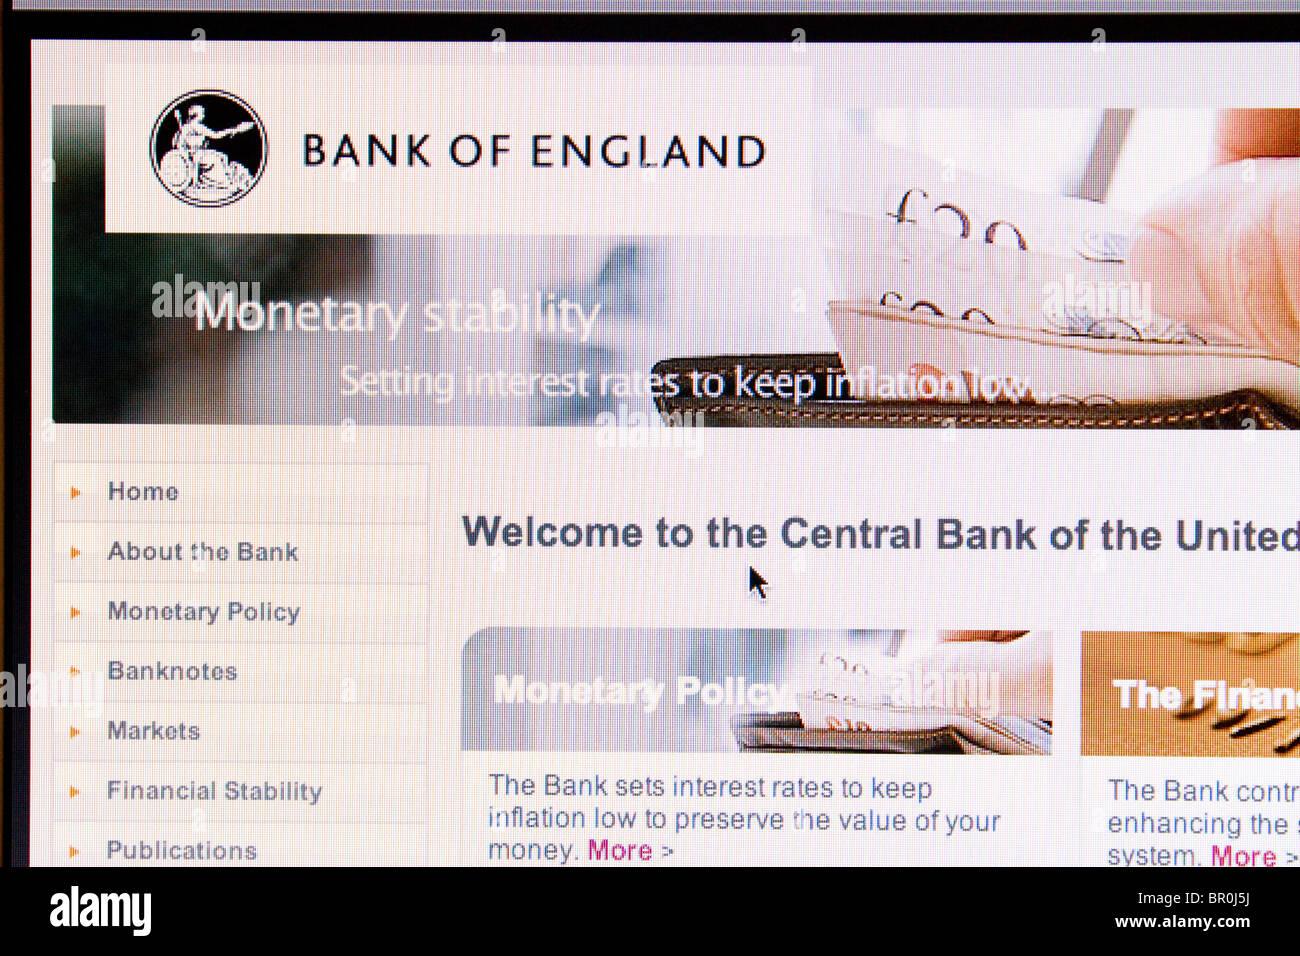 Bank of England Screenshot - Stock Image